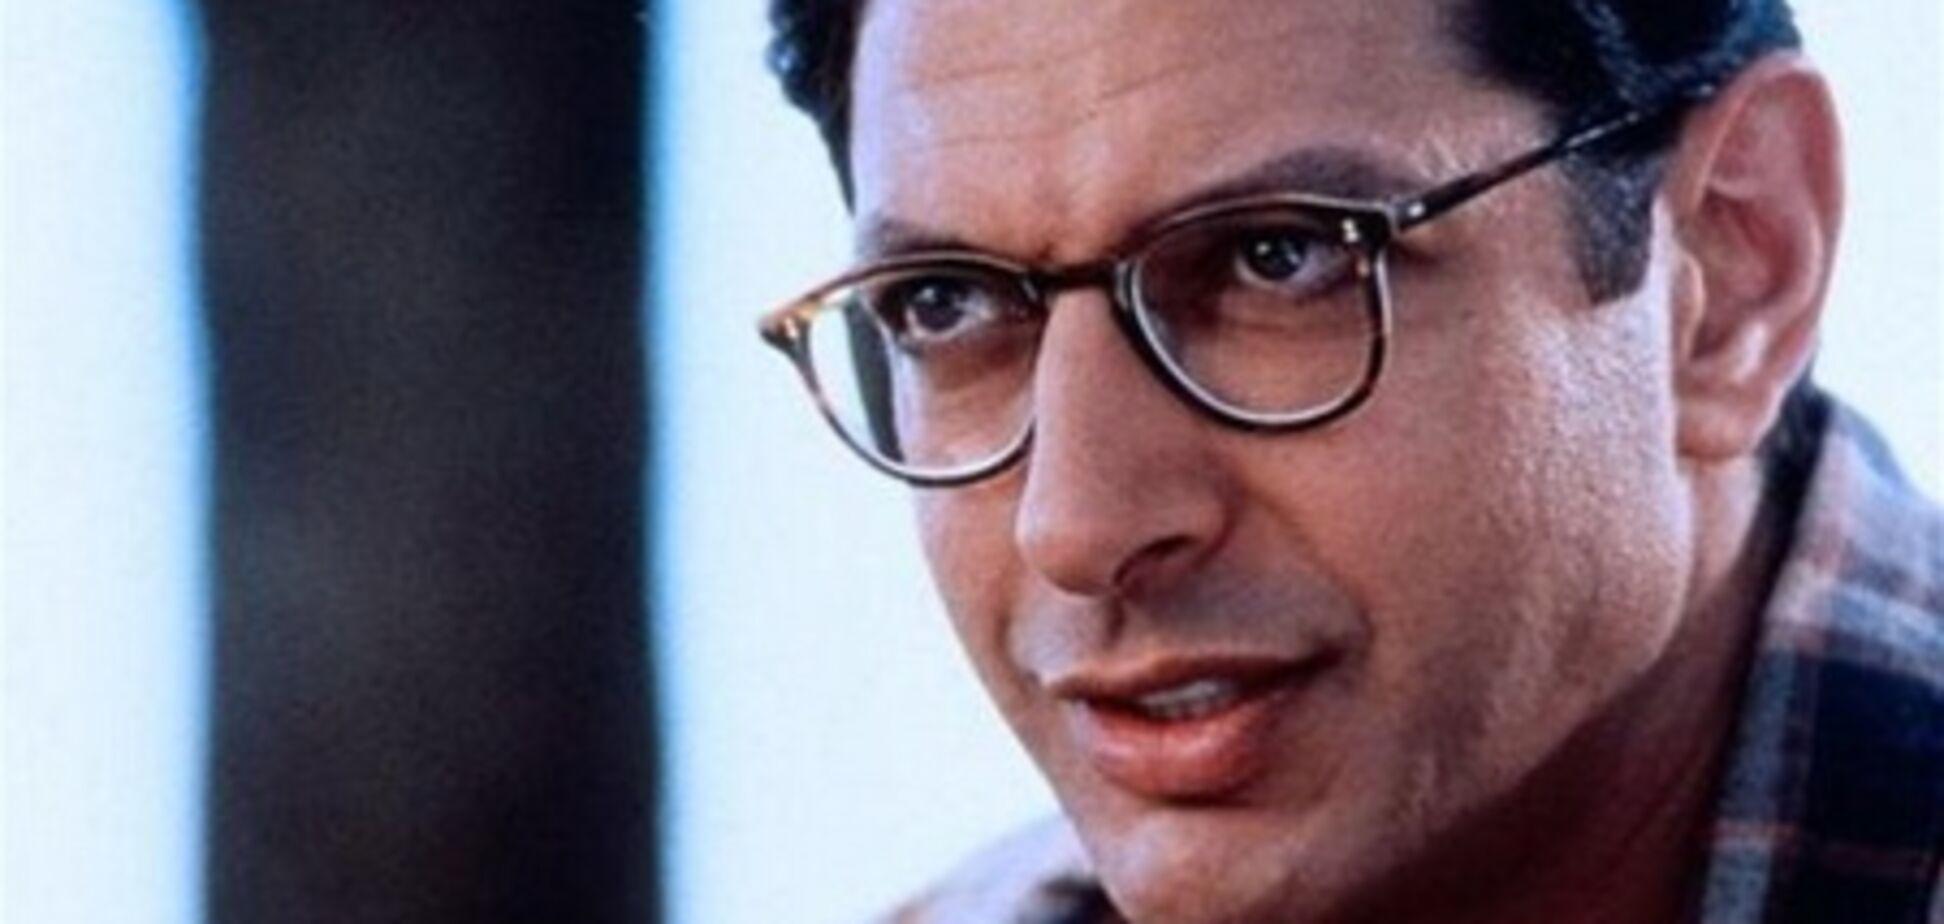 Джефф Голдблюм даст отпор пришельцам вместо Уилла Смита